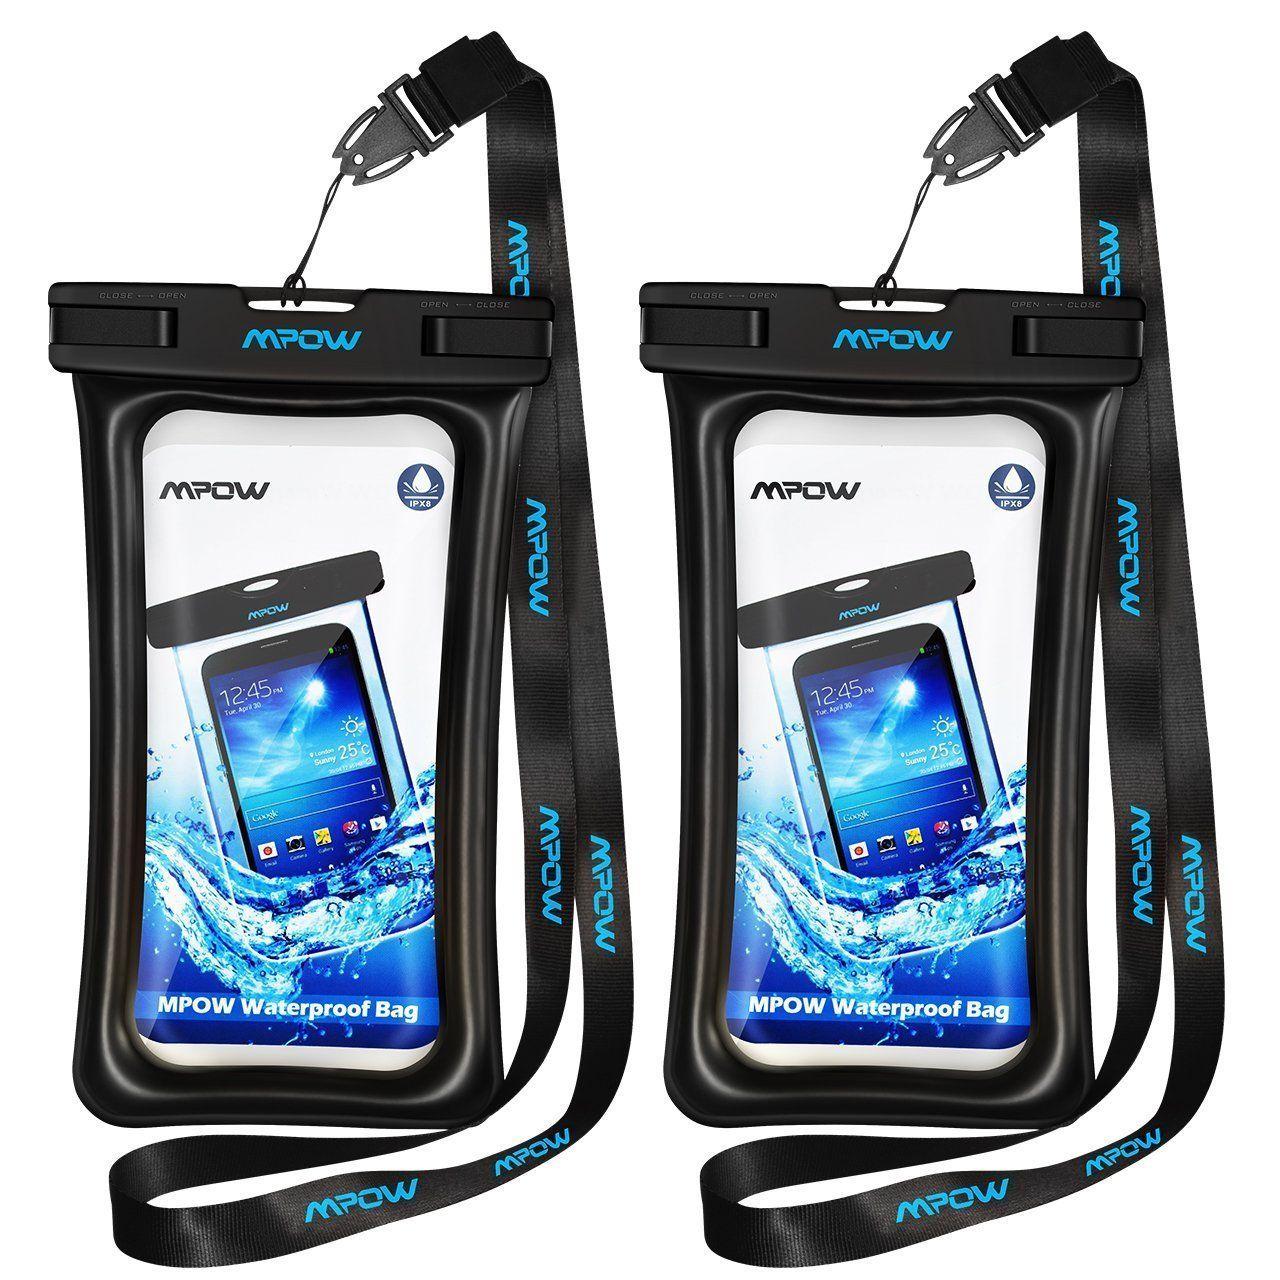 huge selection of 613e4 7cee1 Amazon.com: Mpow Floating Waterproof Case, IPX8 Waterproof iPhone ...